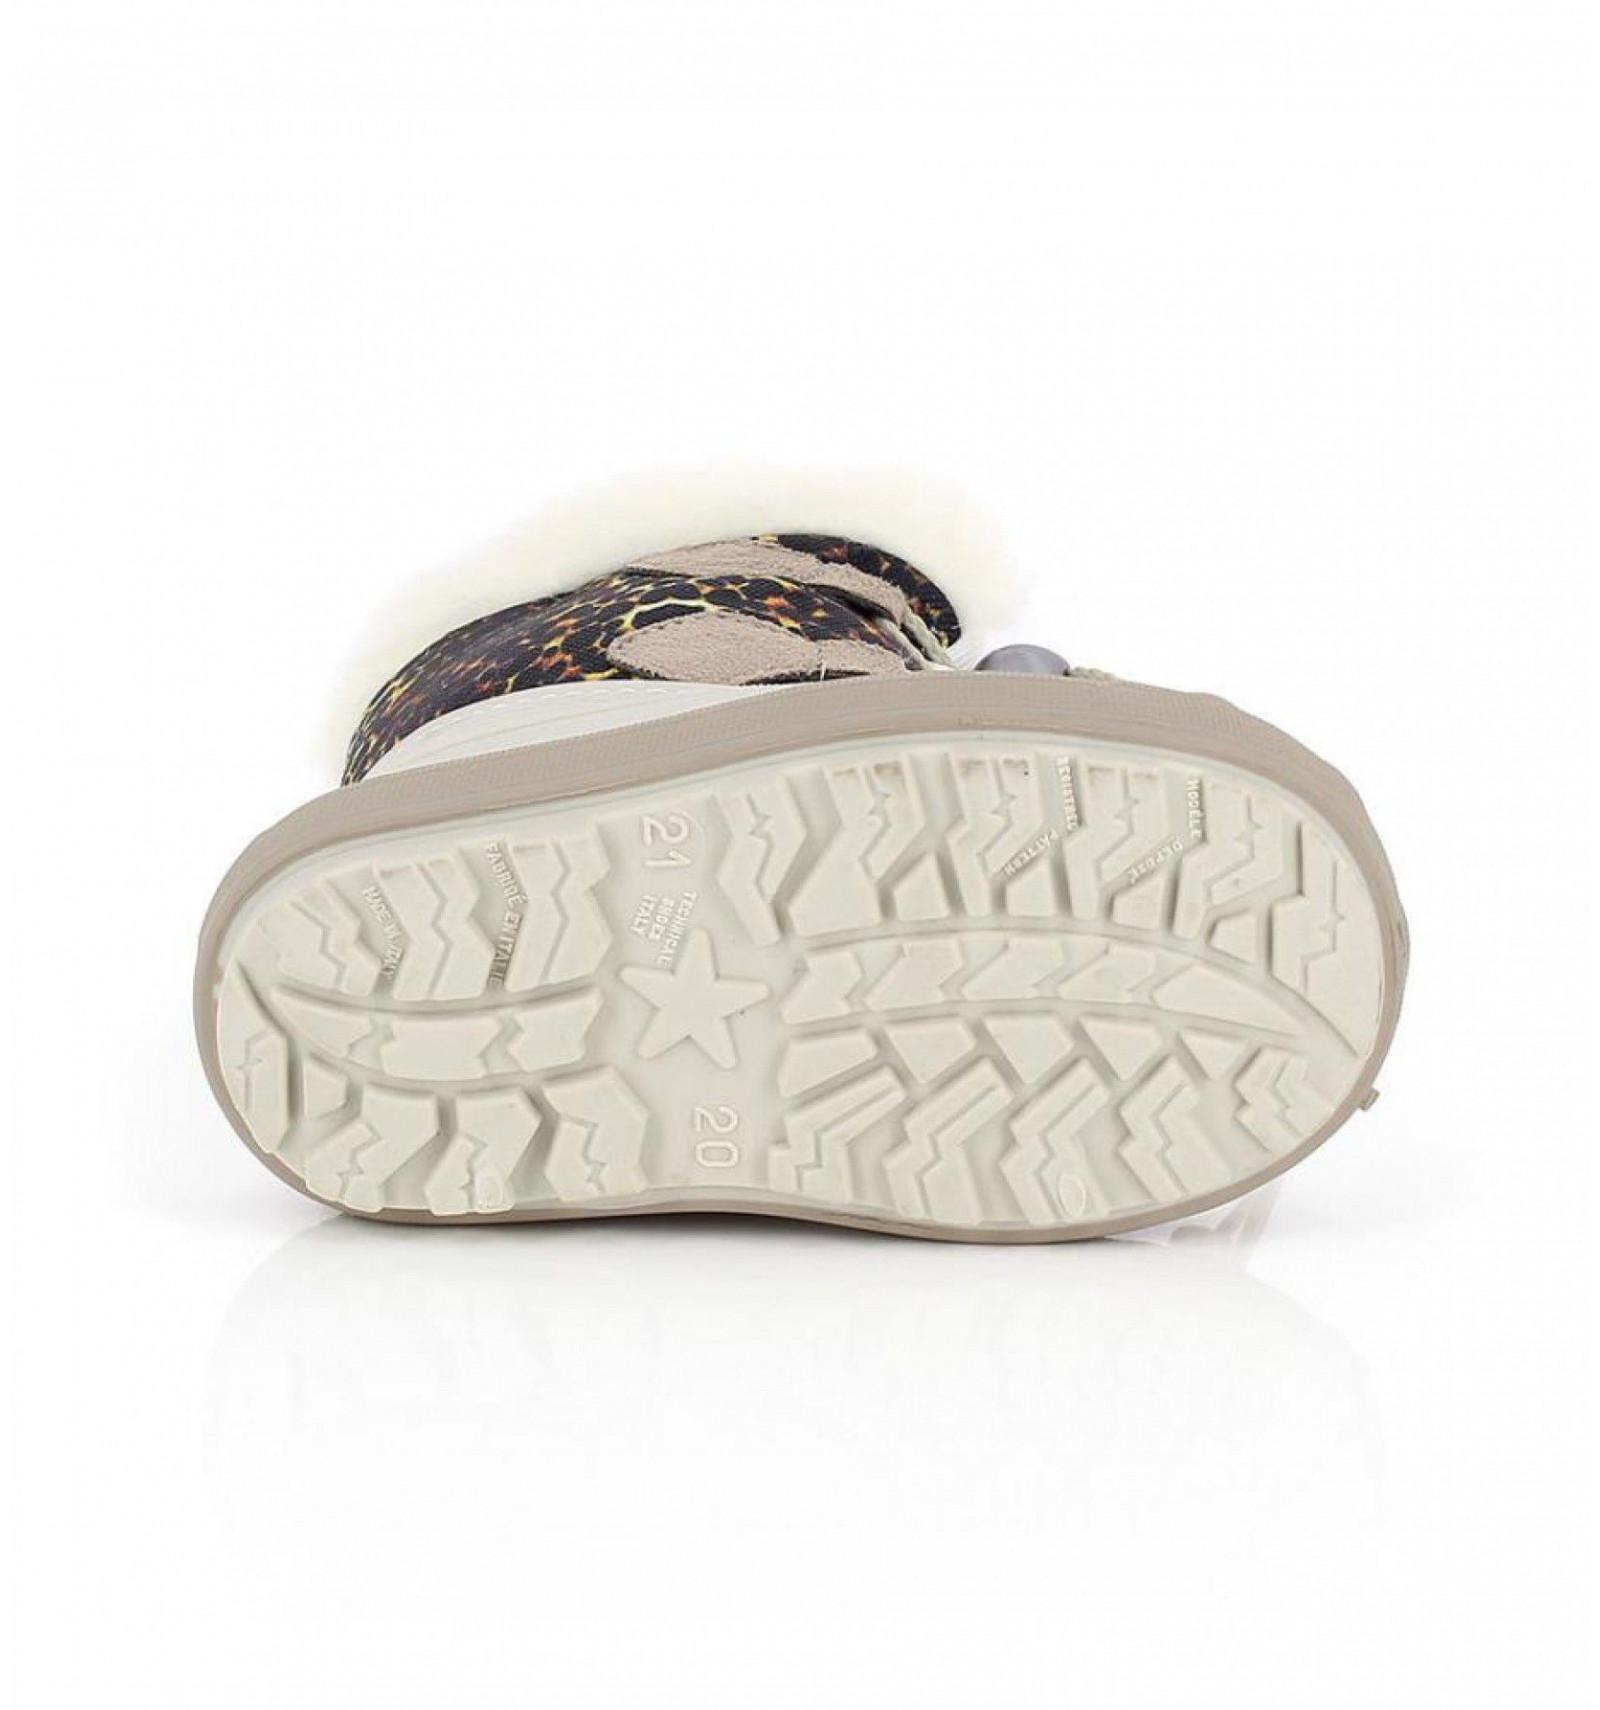 botte apr s ski b b calypso kimberfeel leopard alpinstore. Black Bedroom Furniture Sets. Home Design Ideas